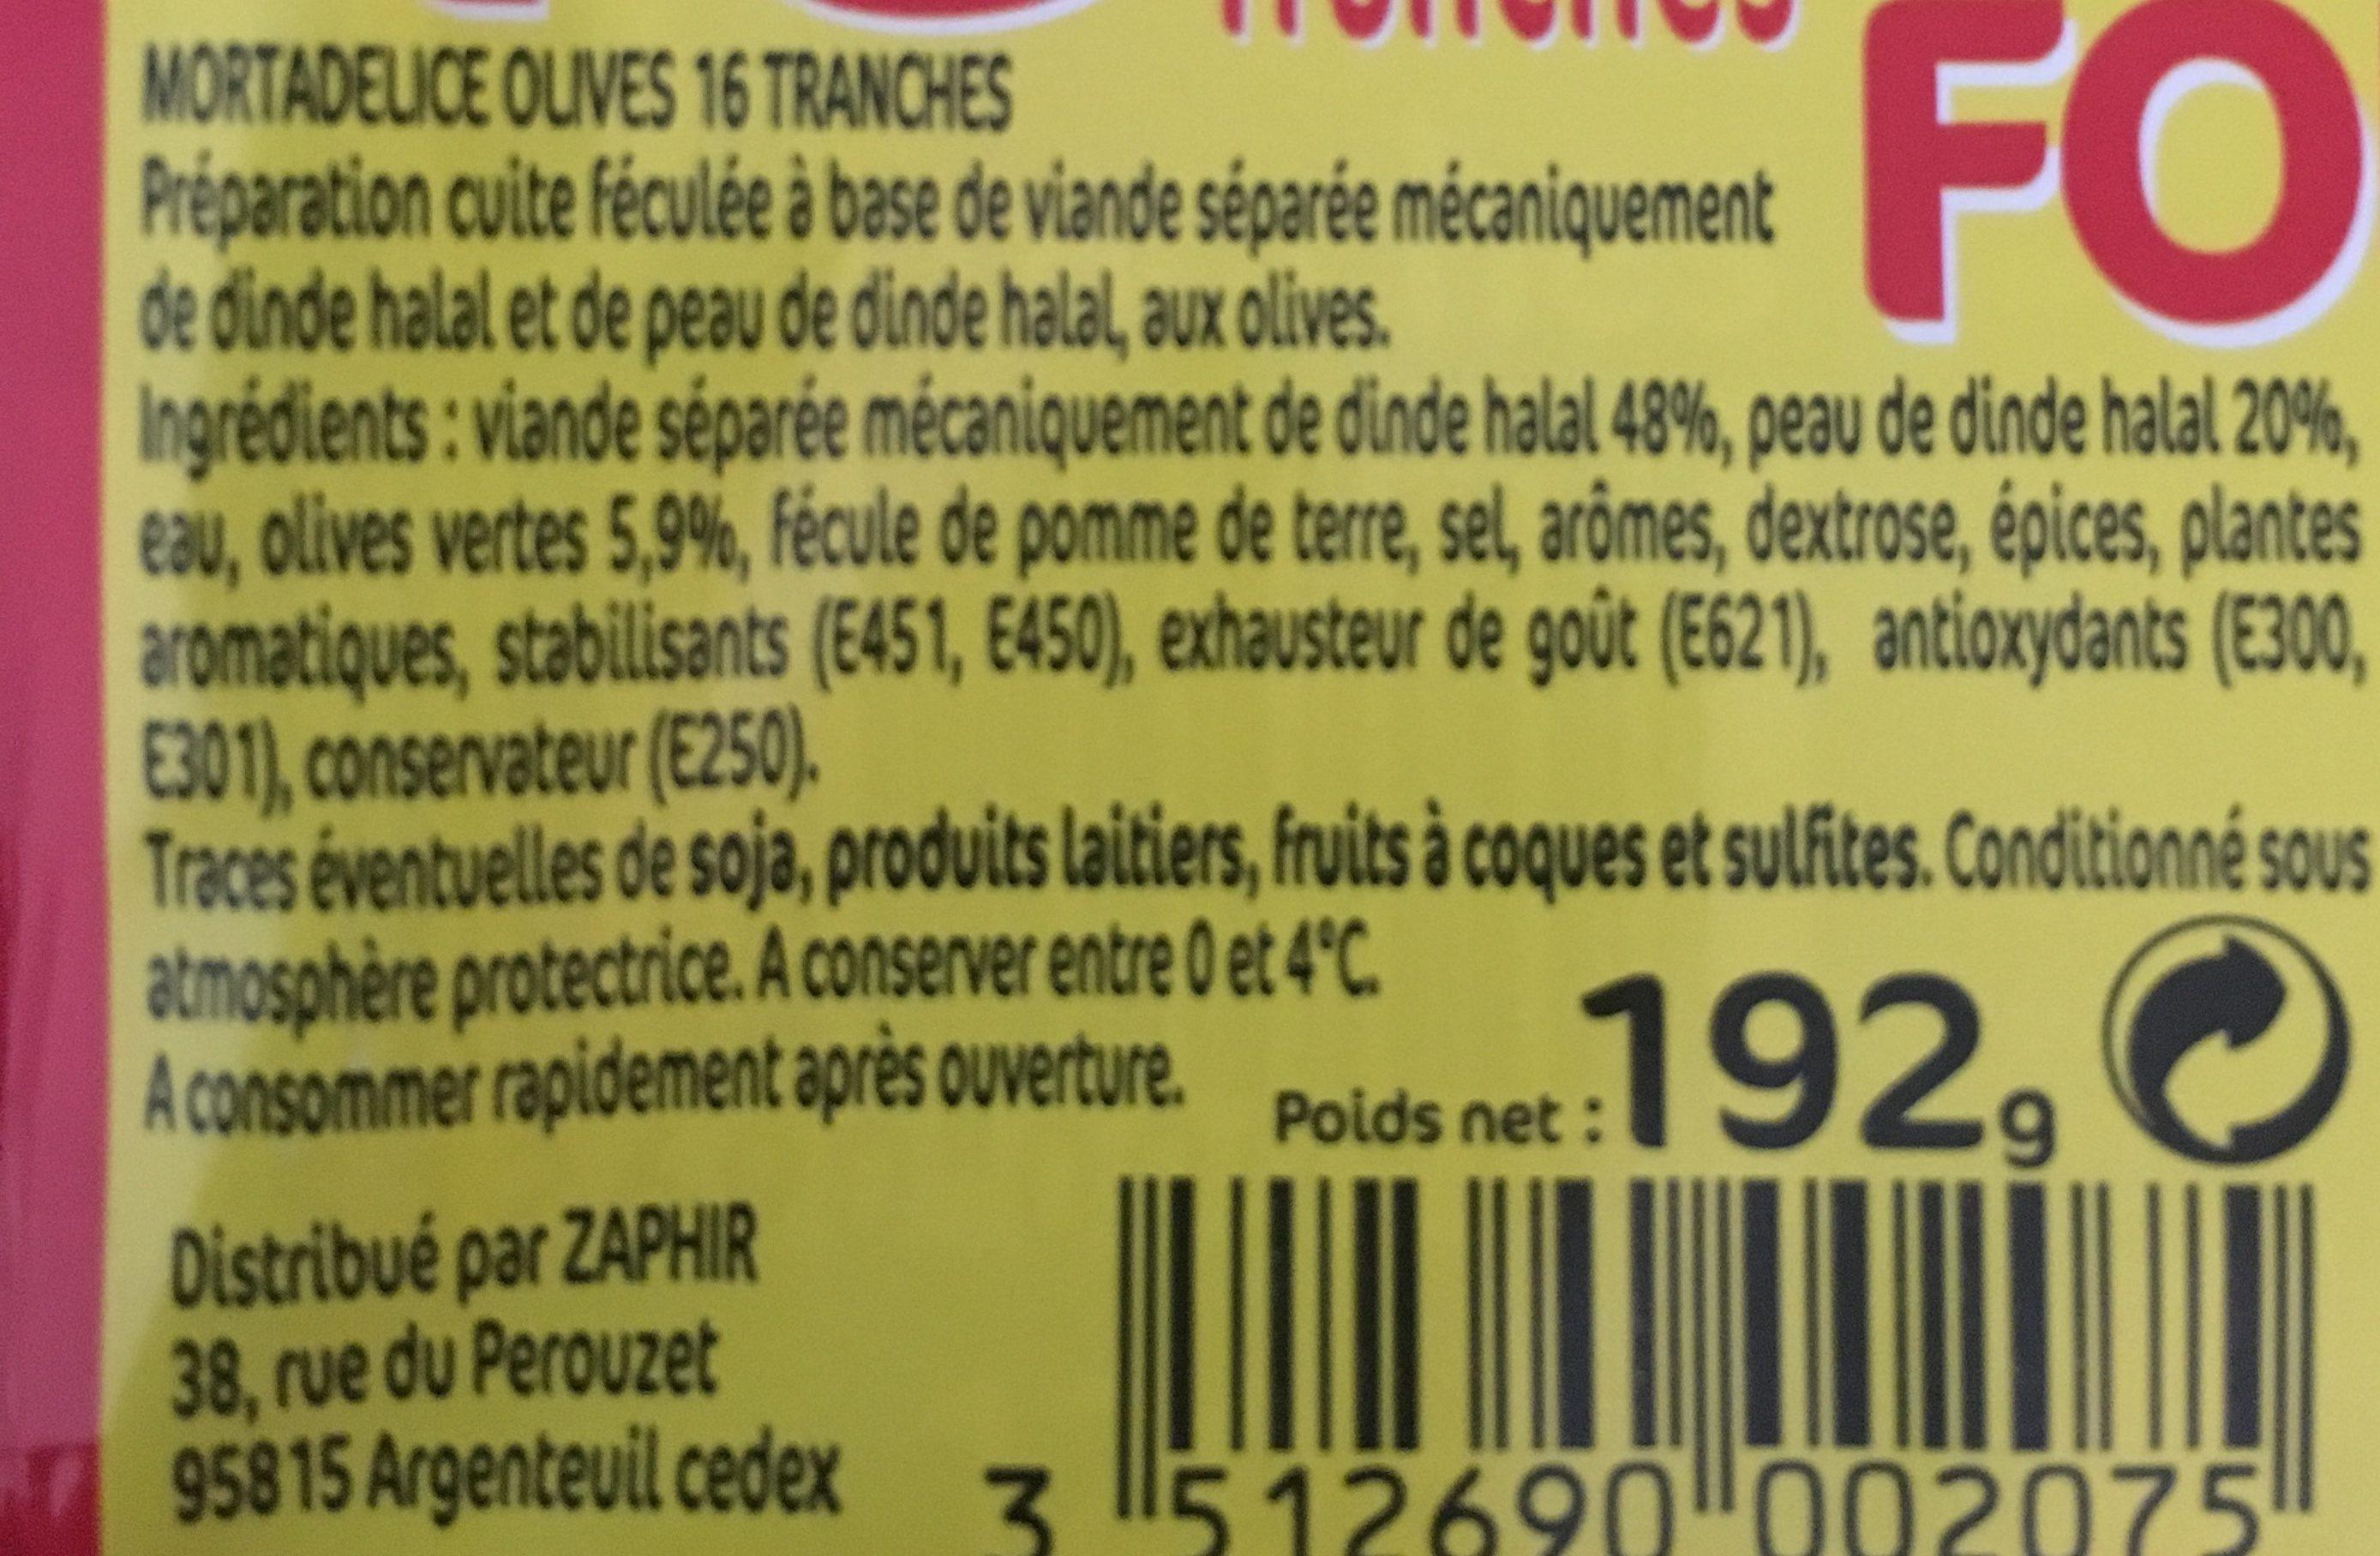 Mortadelle olive tranche - Ingredients